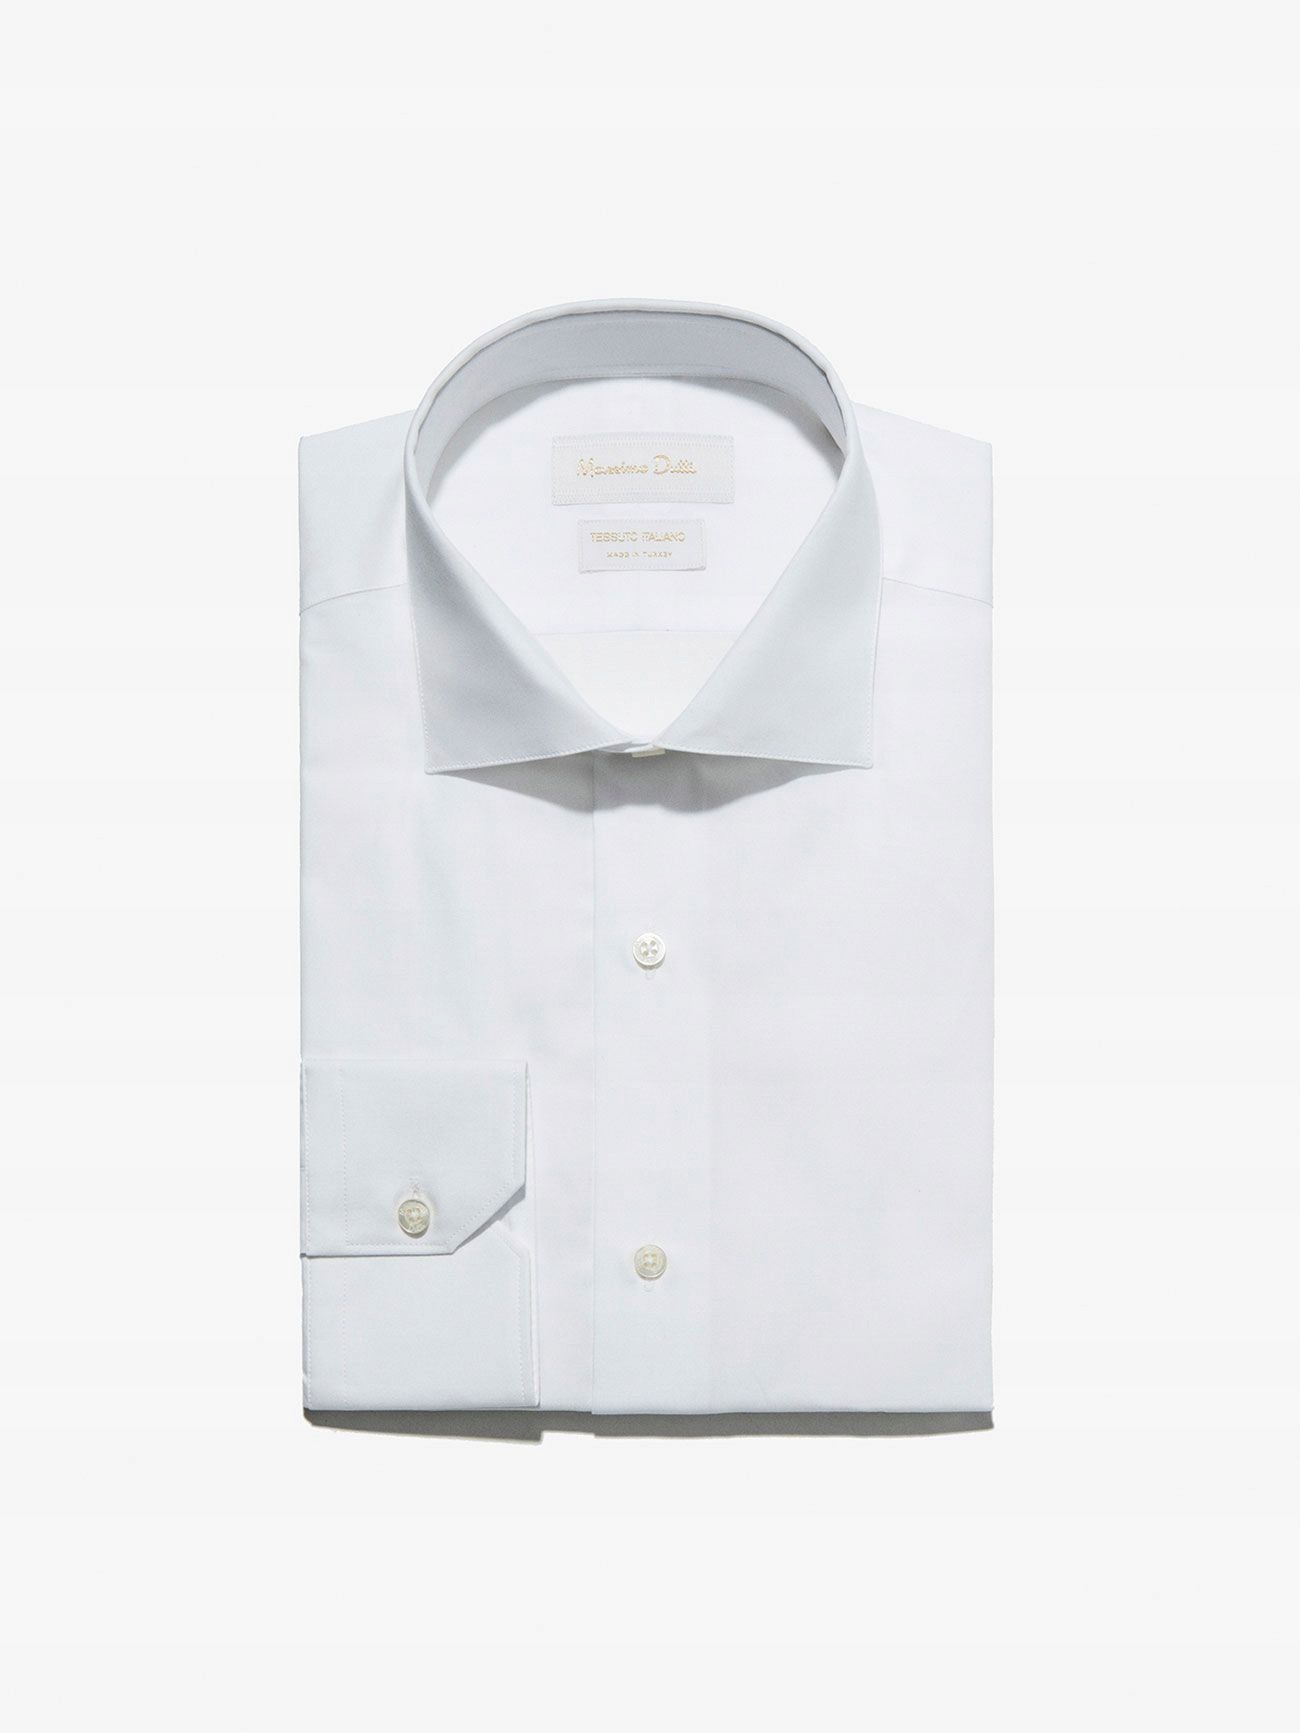 MASSIMO D Klasyczna biała koszula slim (40) 7409347269  BB3g3